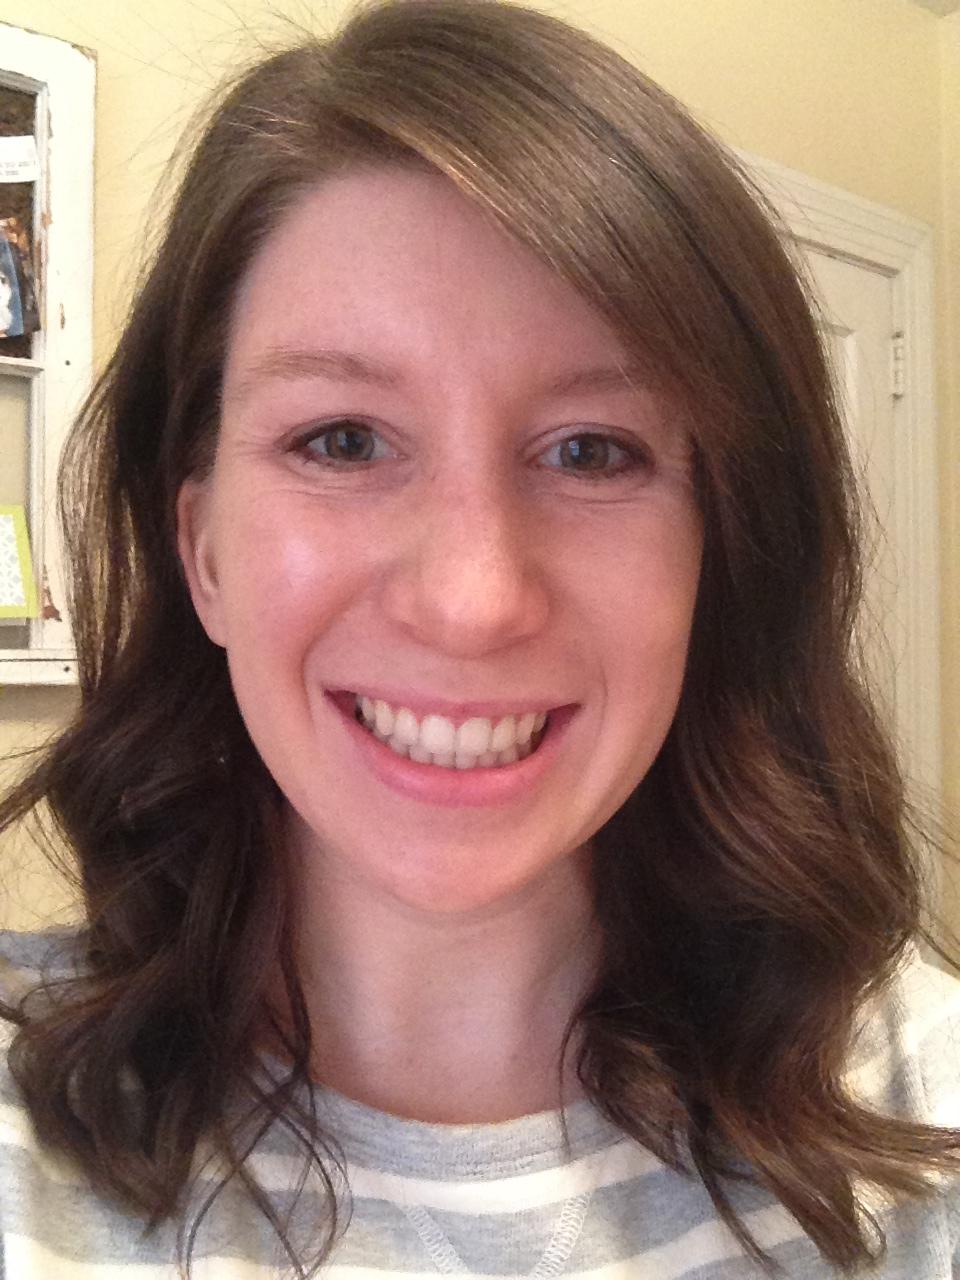 Carly Prentice